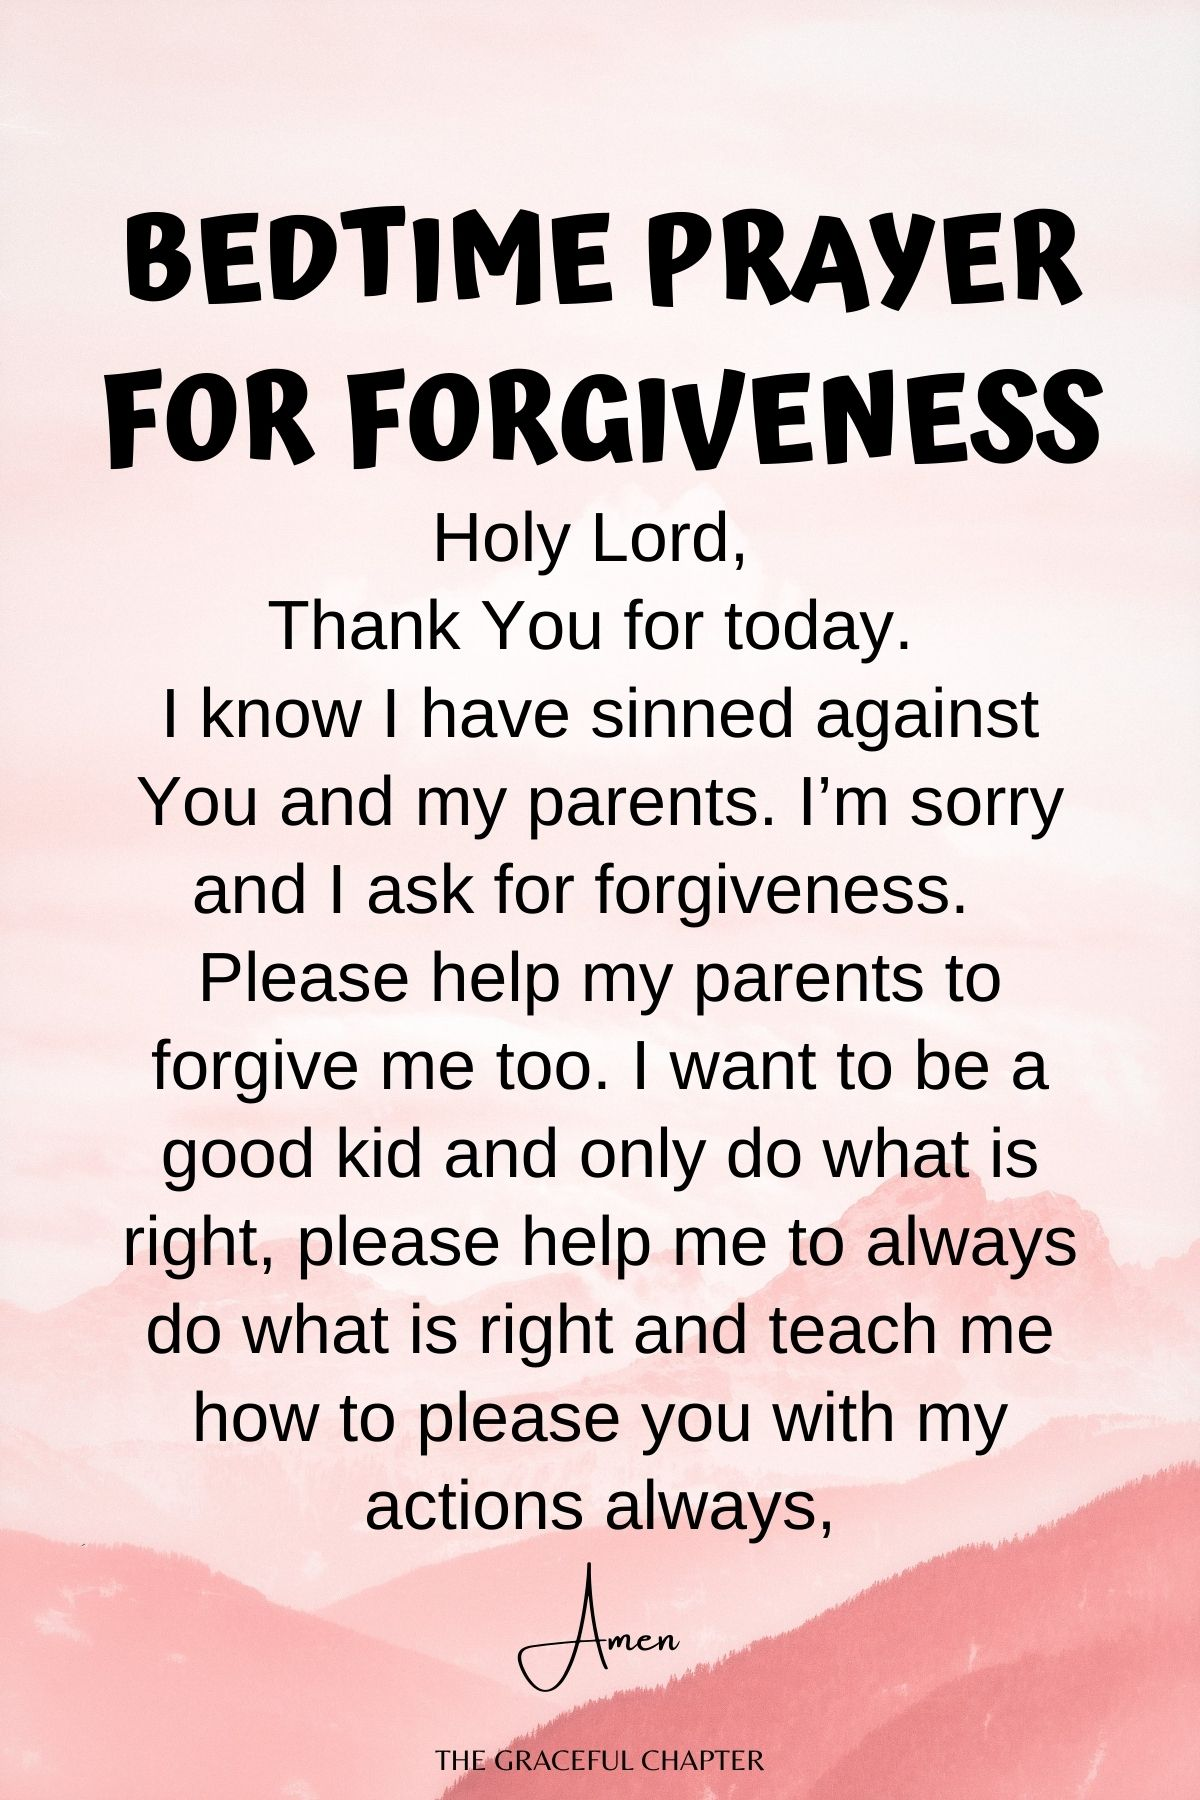 Bedtime prayer for forgiveness